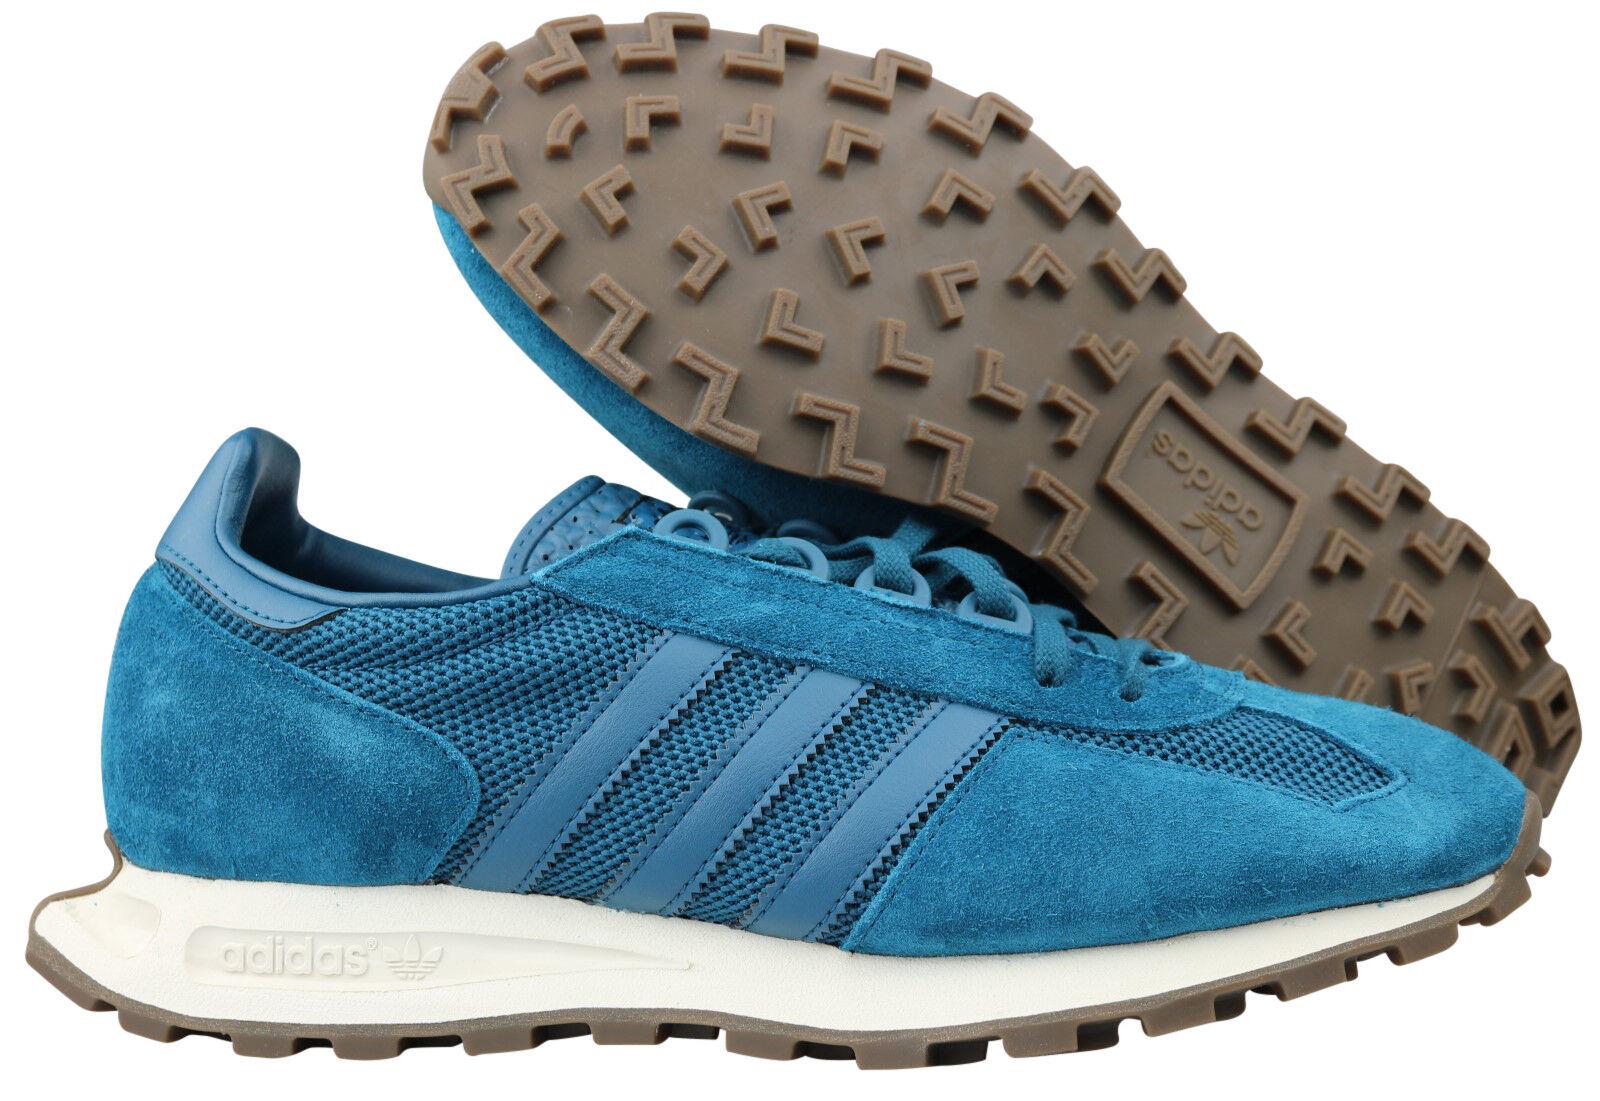 Adidas Hamburg originals..100% genuine..unisex trainers Taille 6 uk Eur Eur Eur 39 1/3 ee5bdf